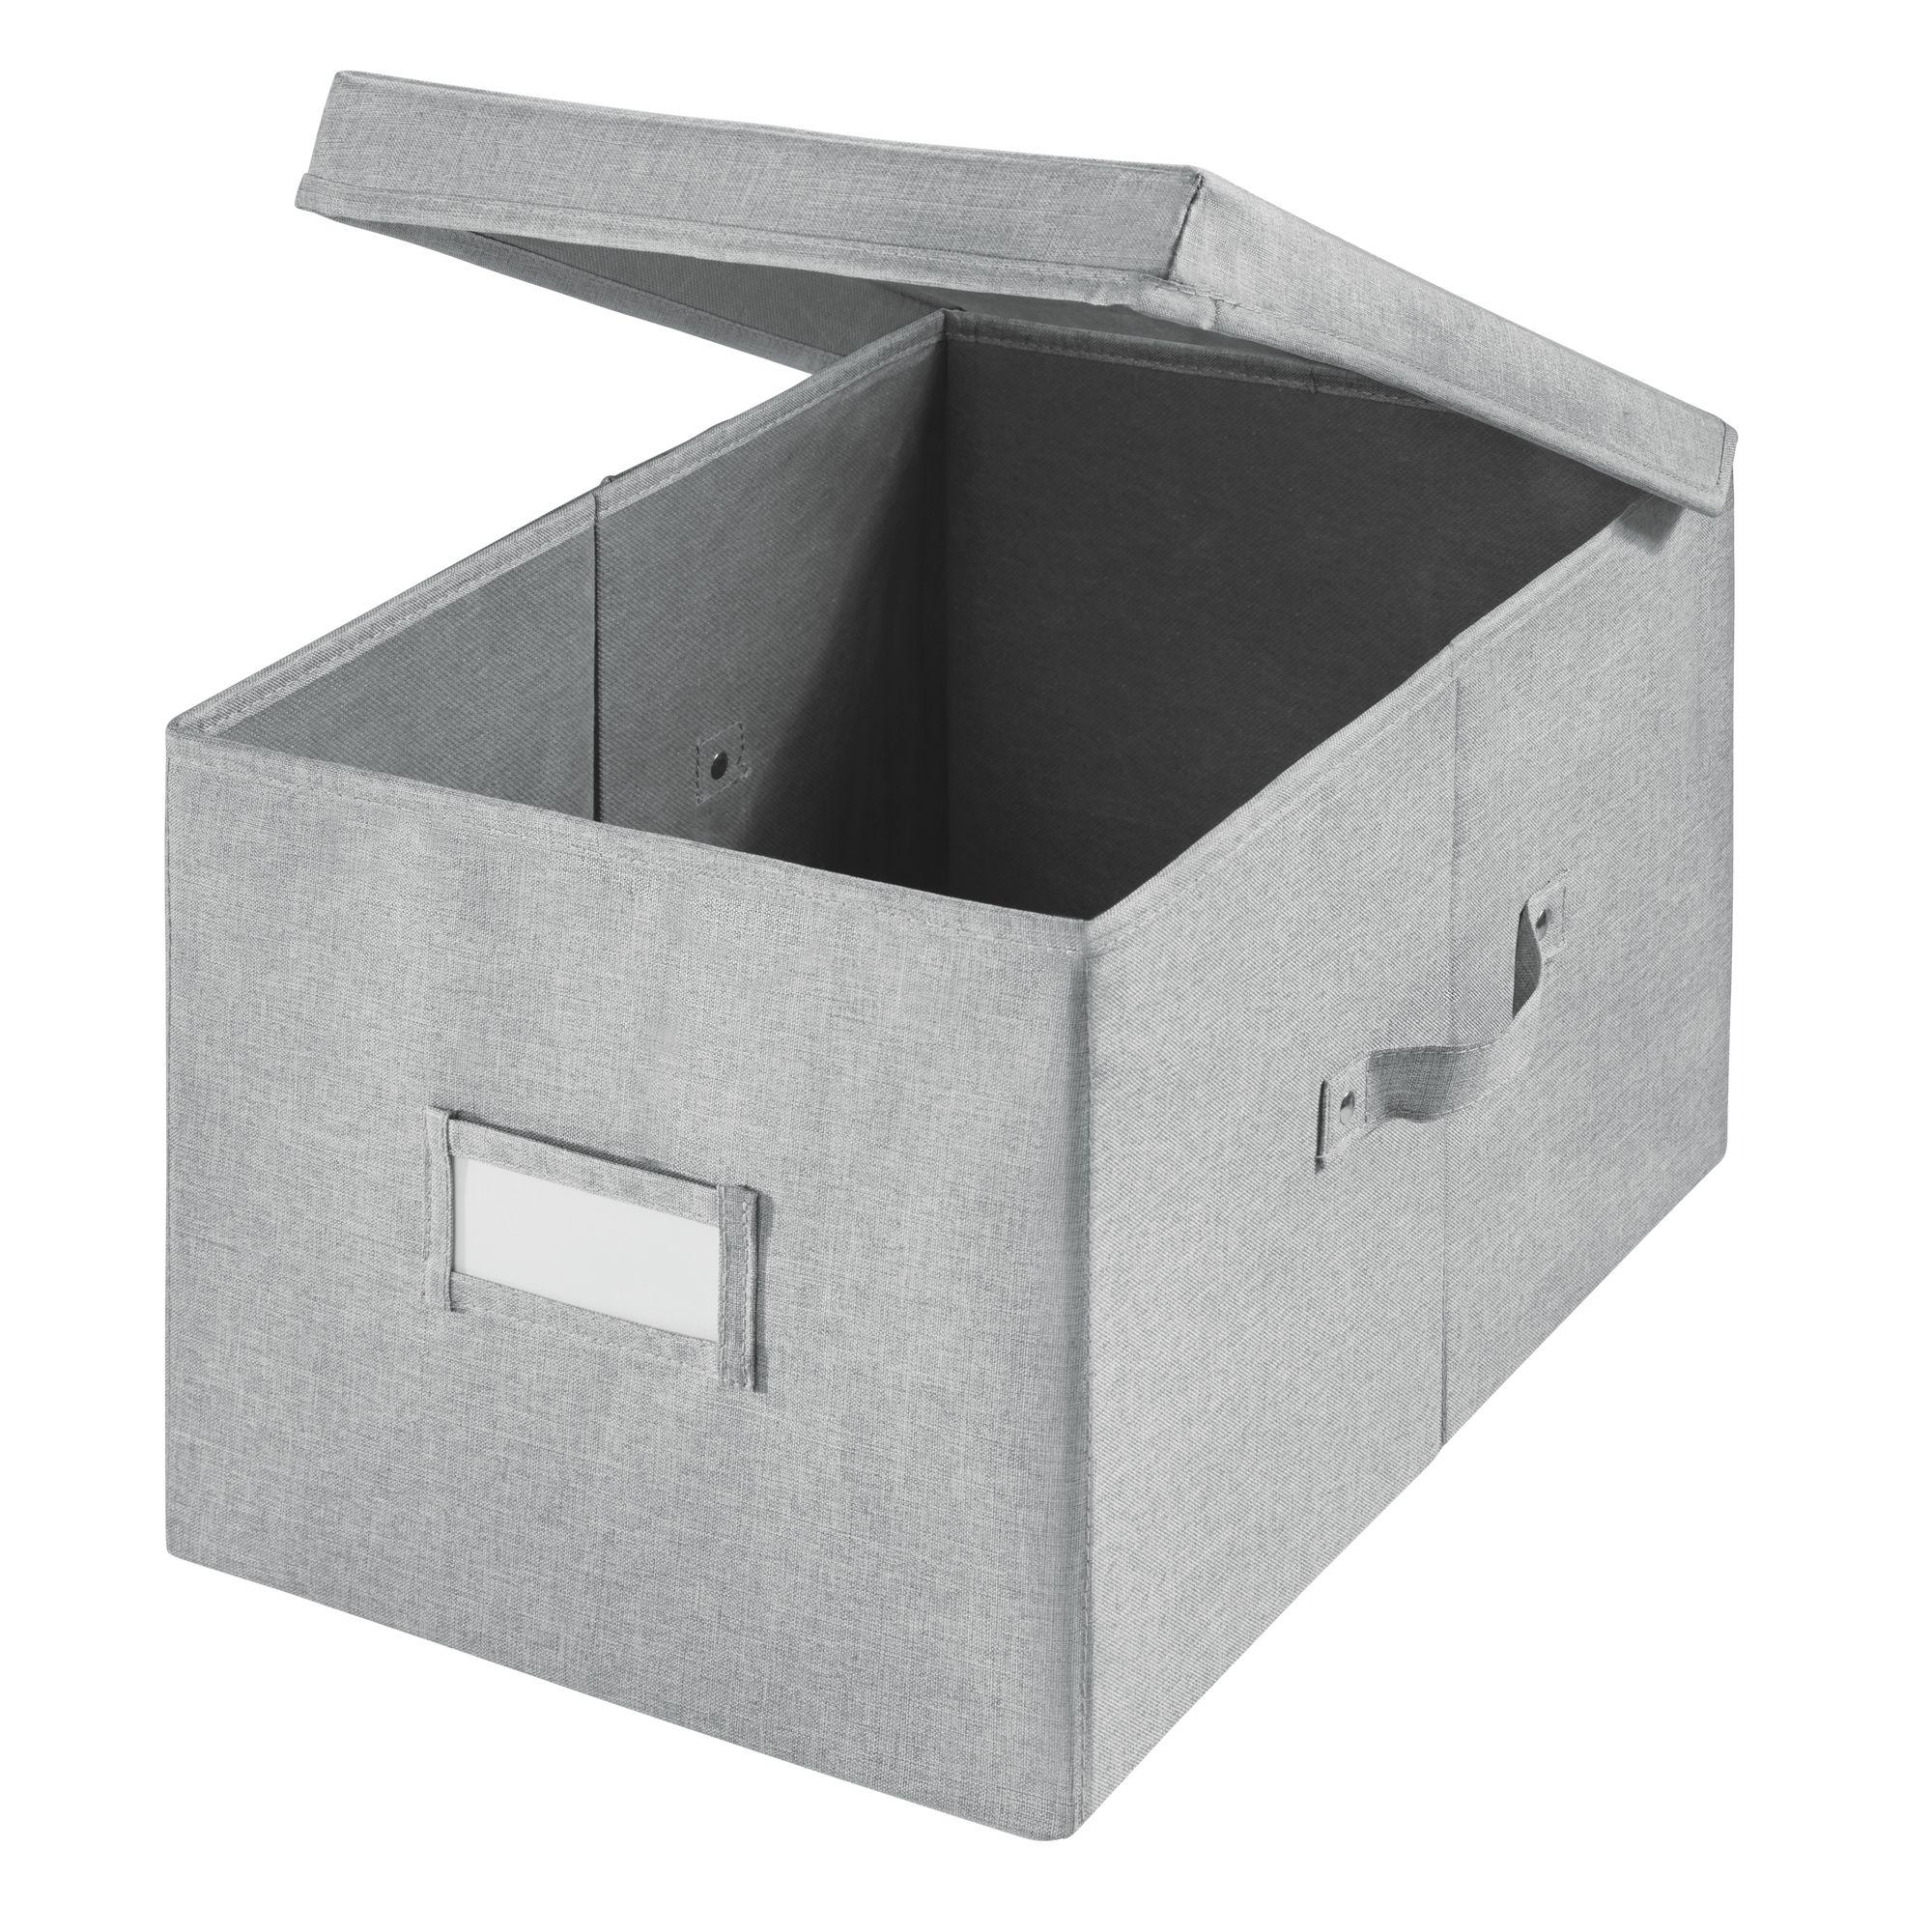 iDesign Codi Fabric Storage Box Organizer, Gray, Various Sizes